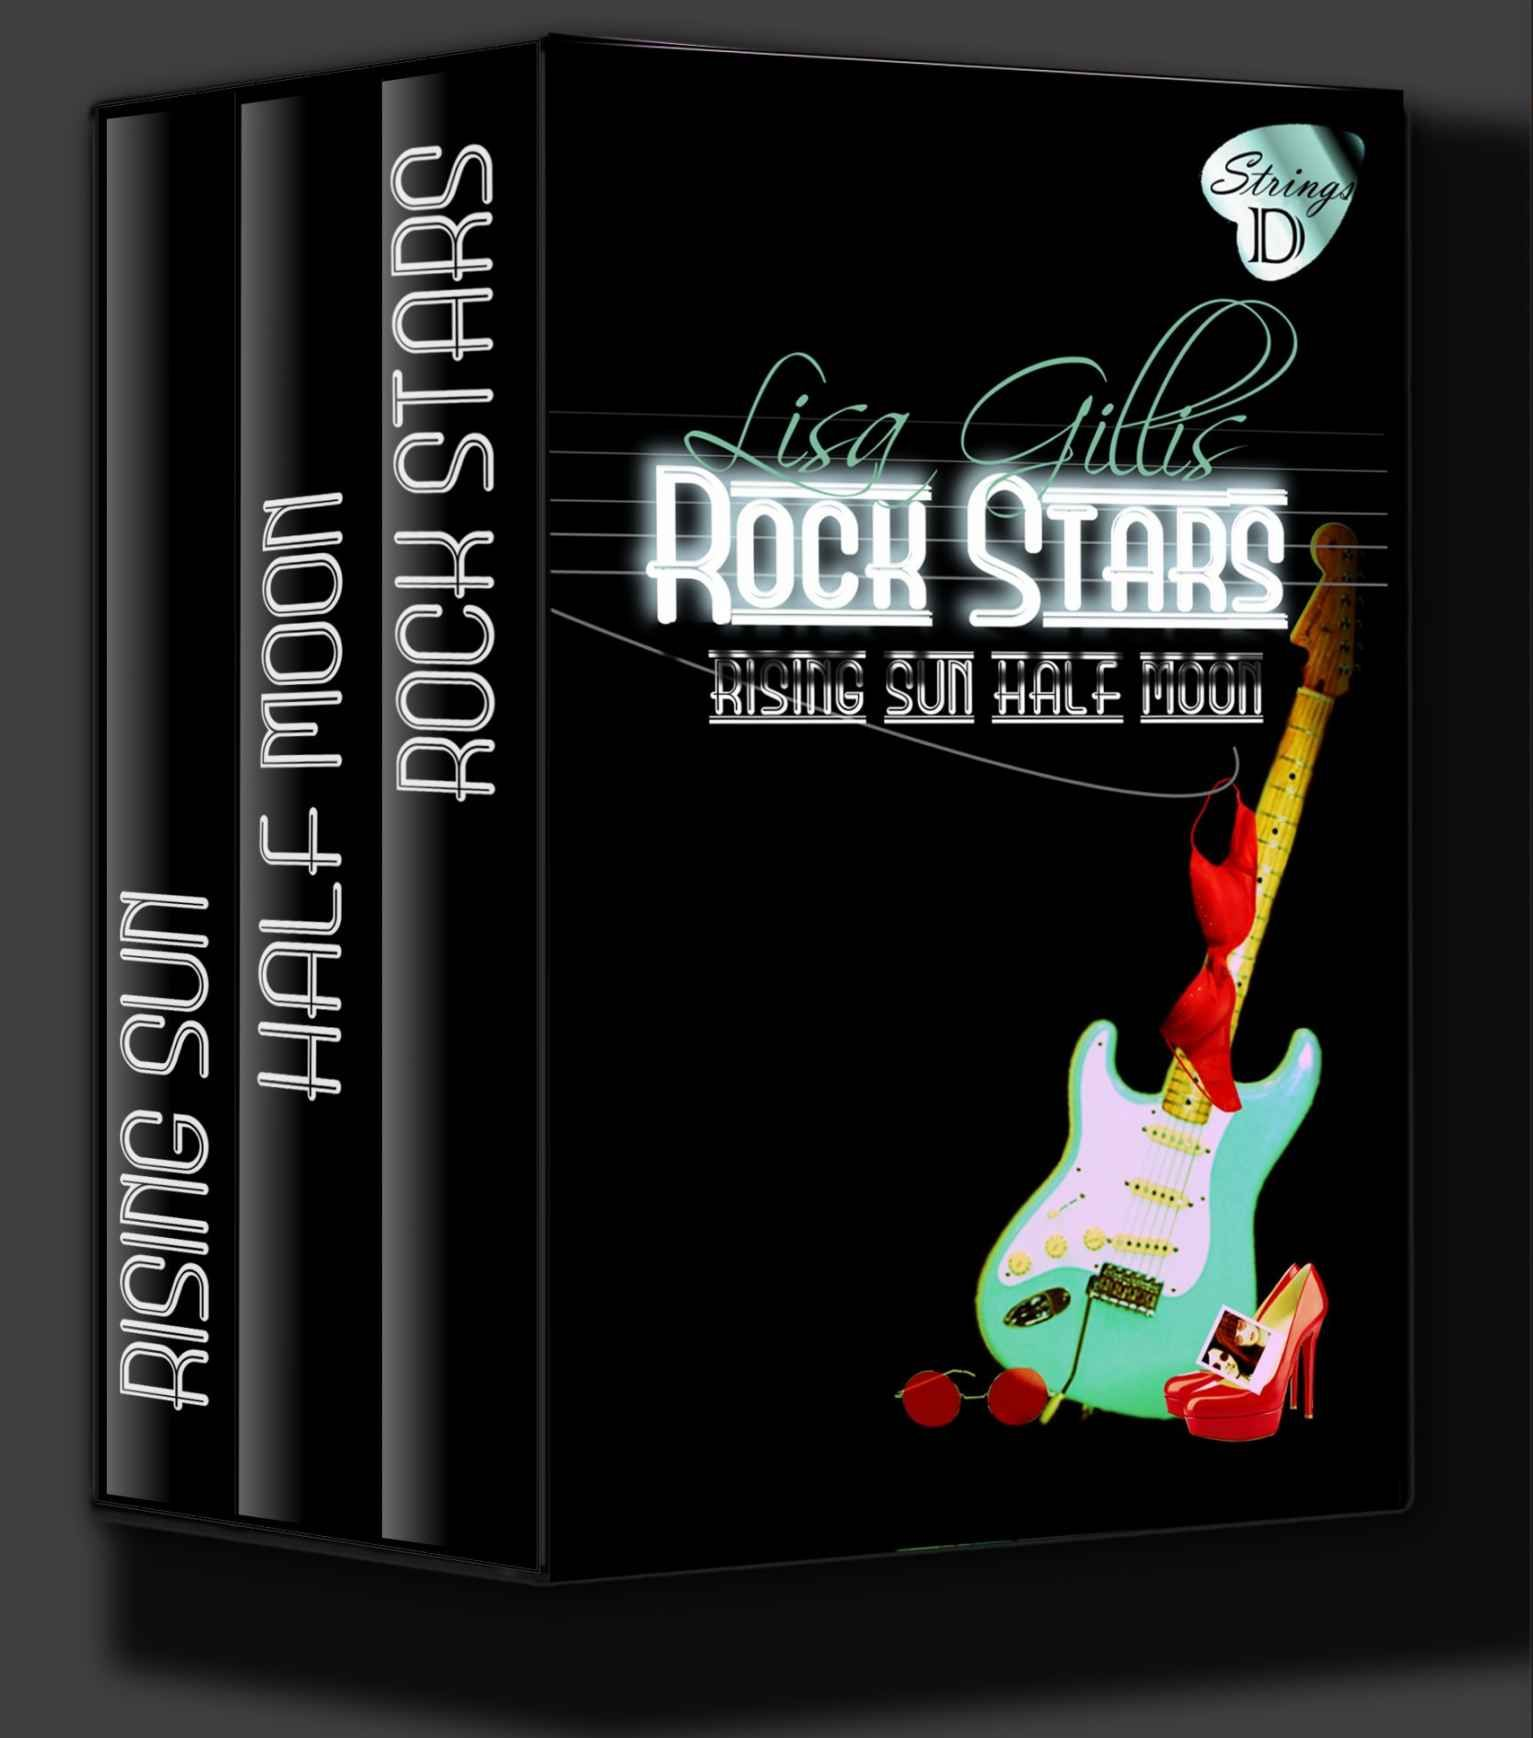 Amazon: Rising Sun, Half Moon, Rock Stars: Dstrings